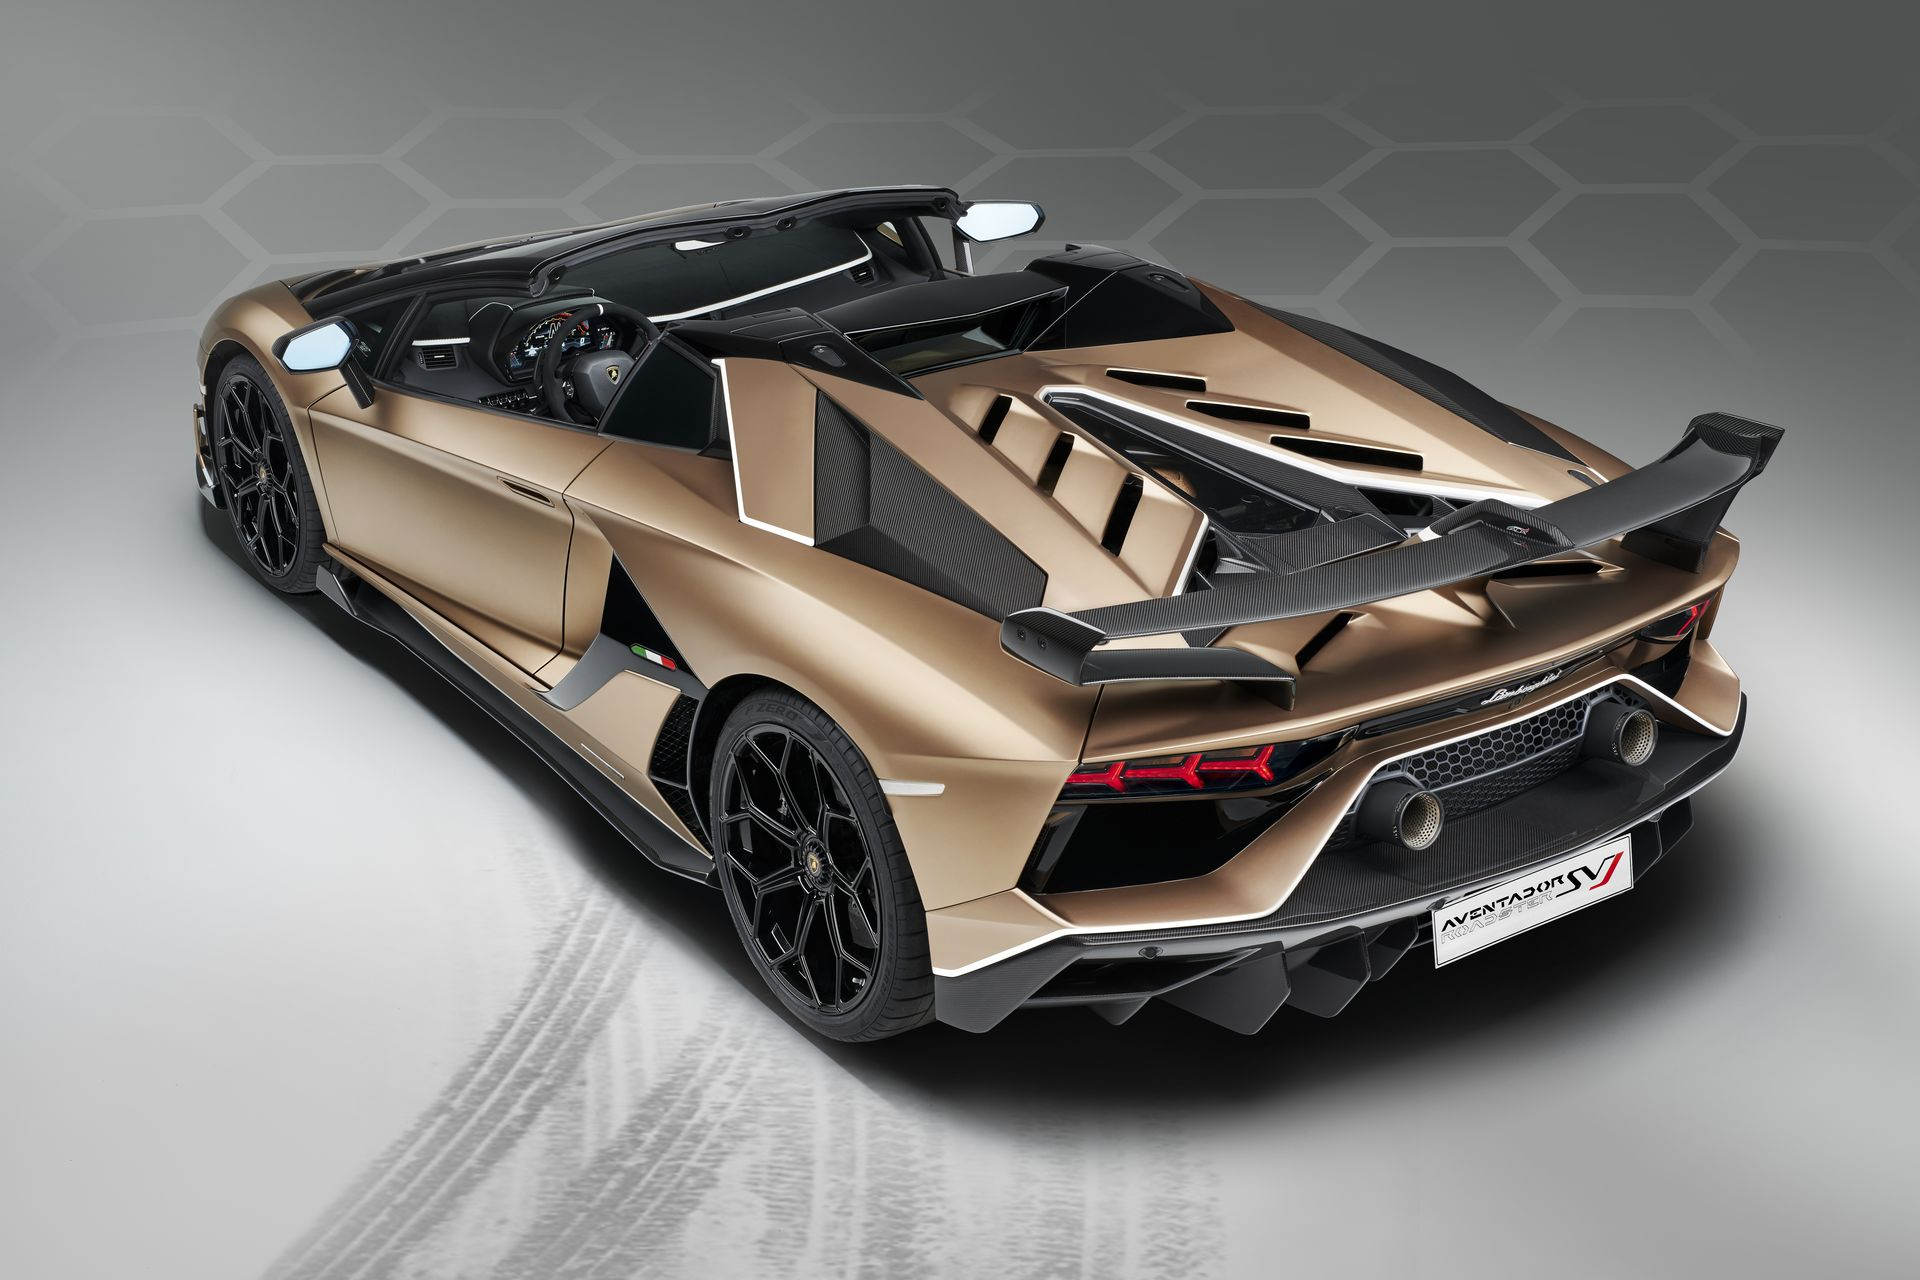 Lamborghini Aventador Svj Roadster 25